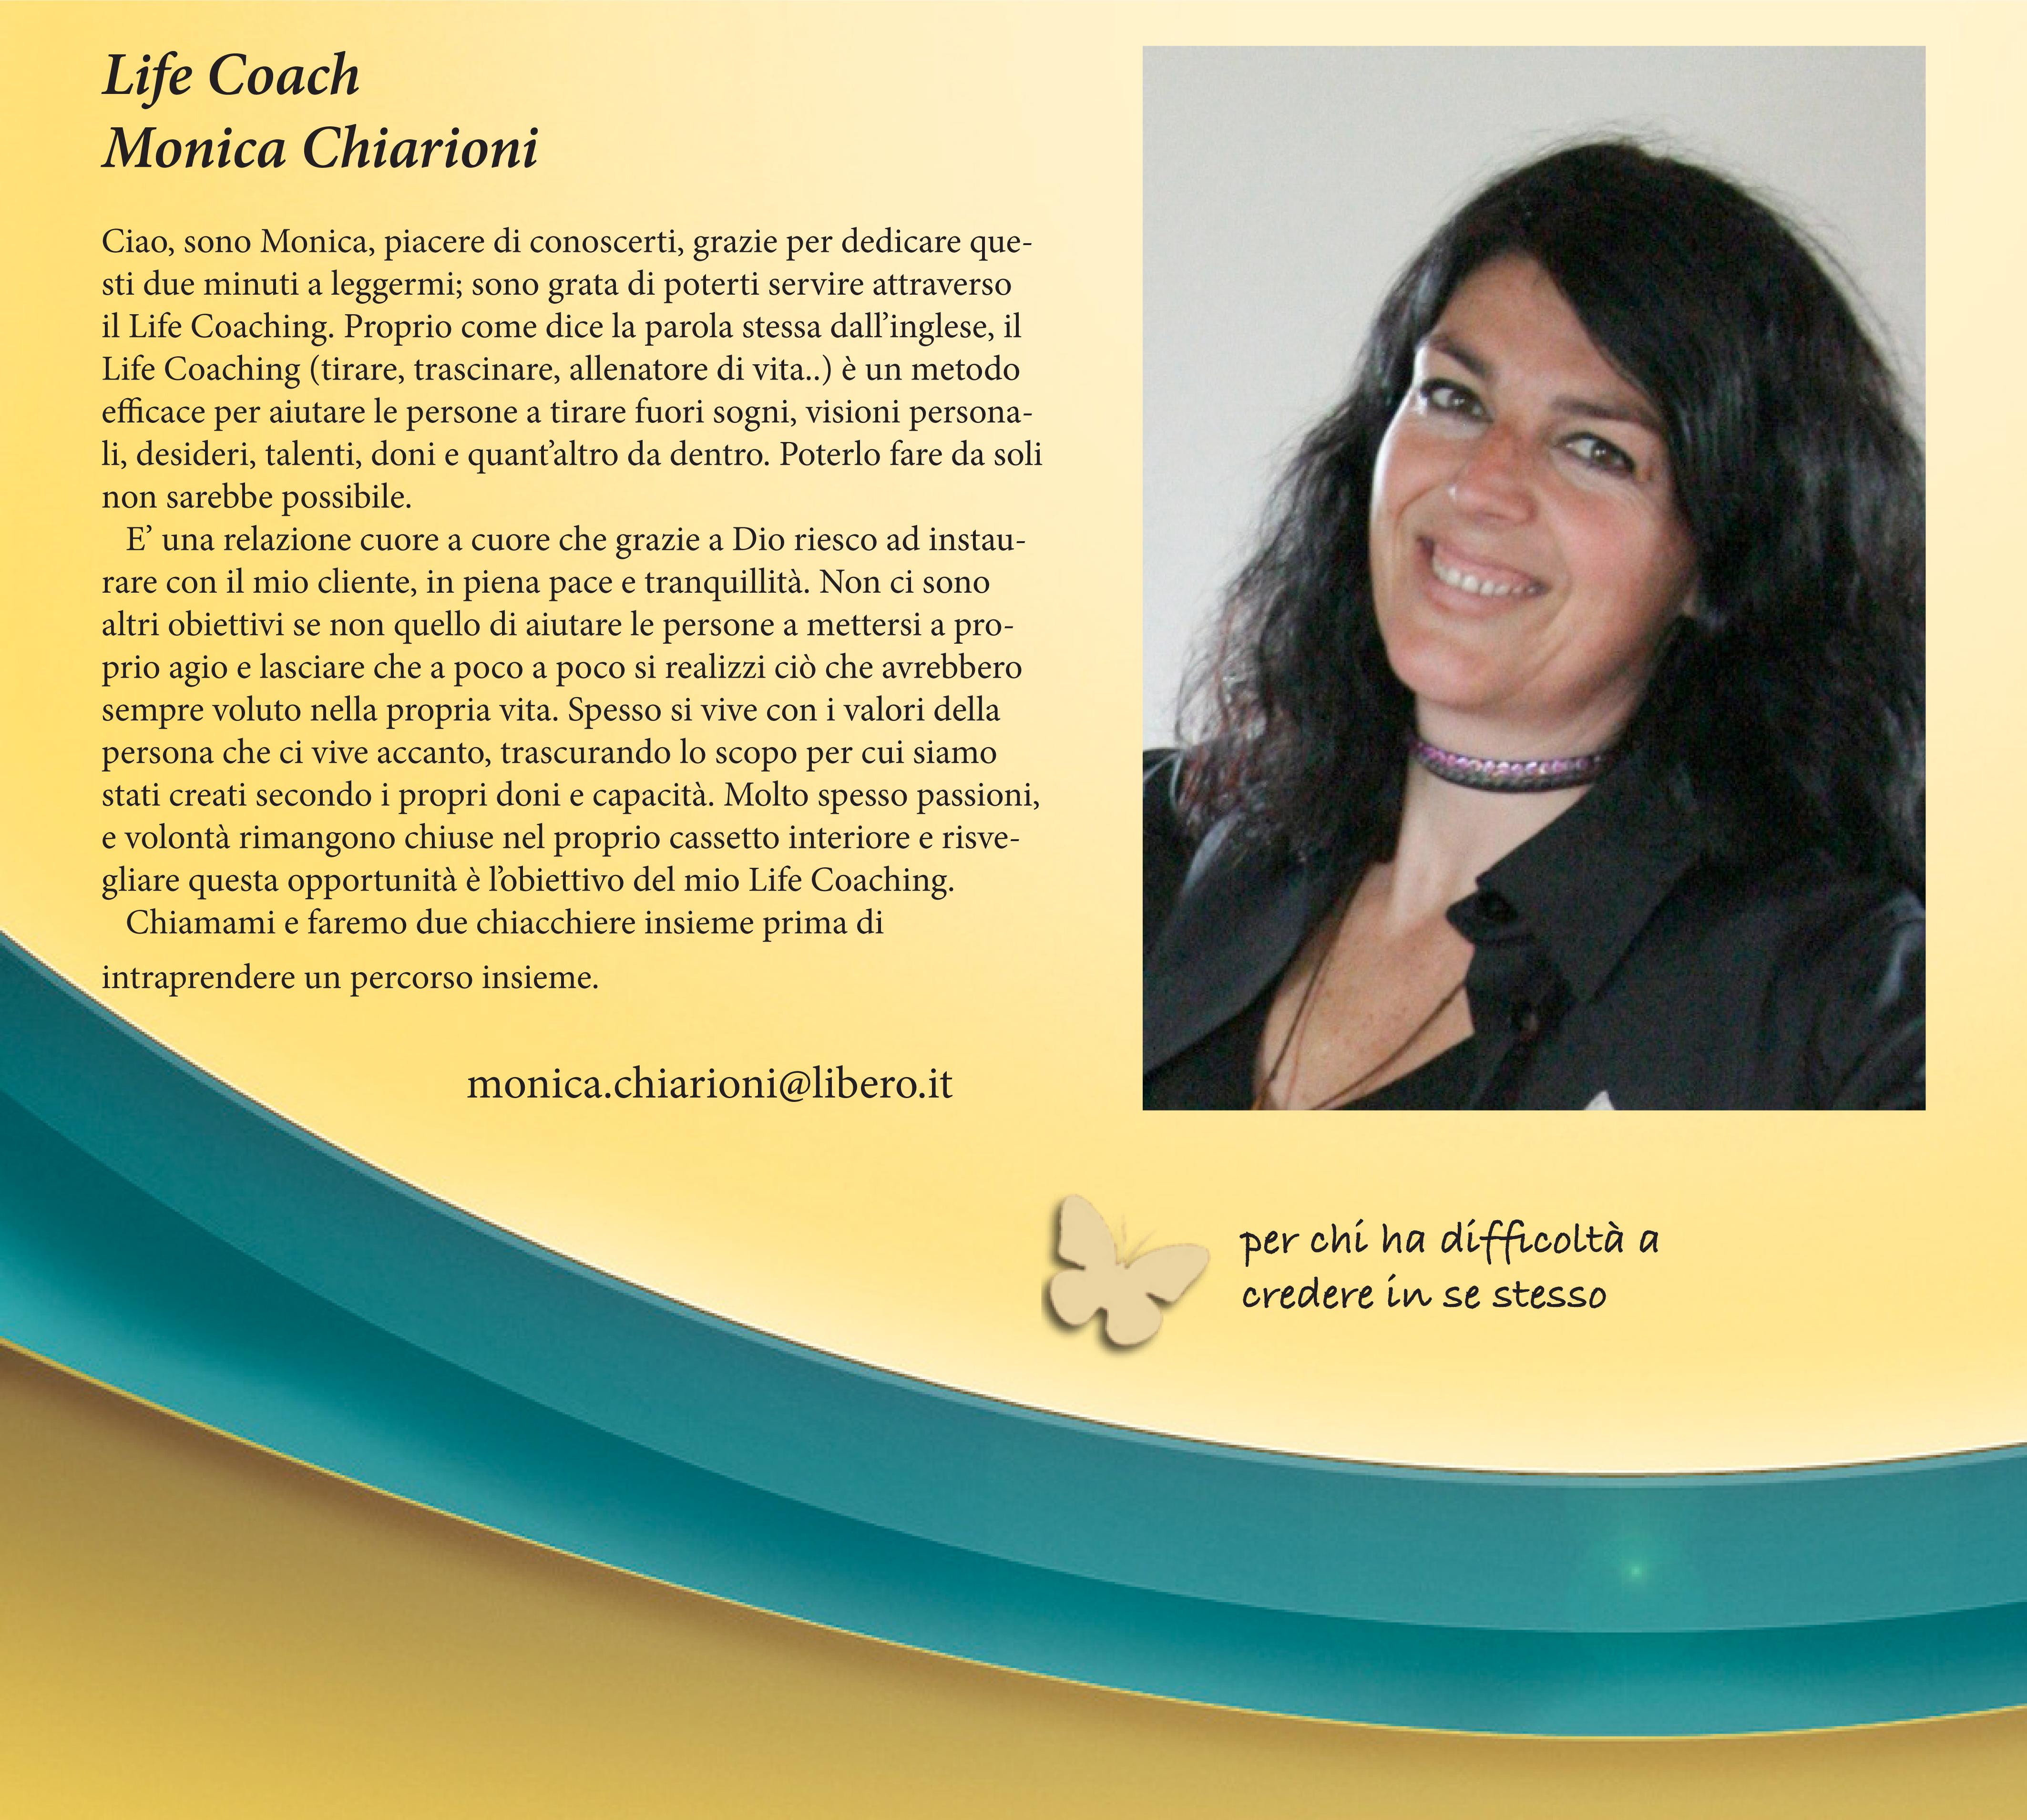 life coach monica 2